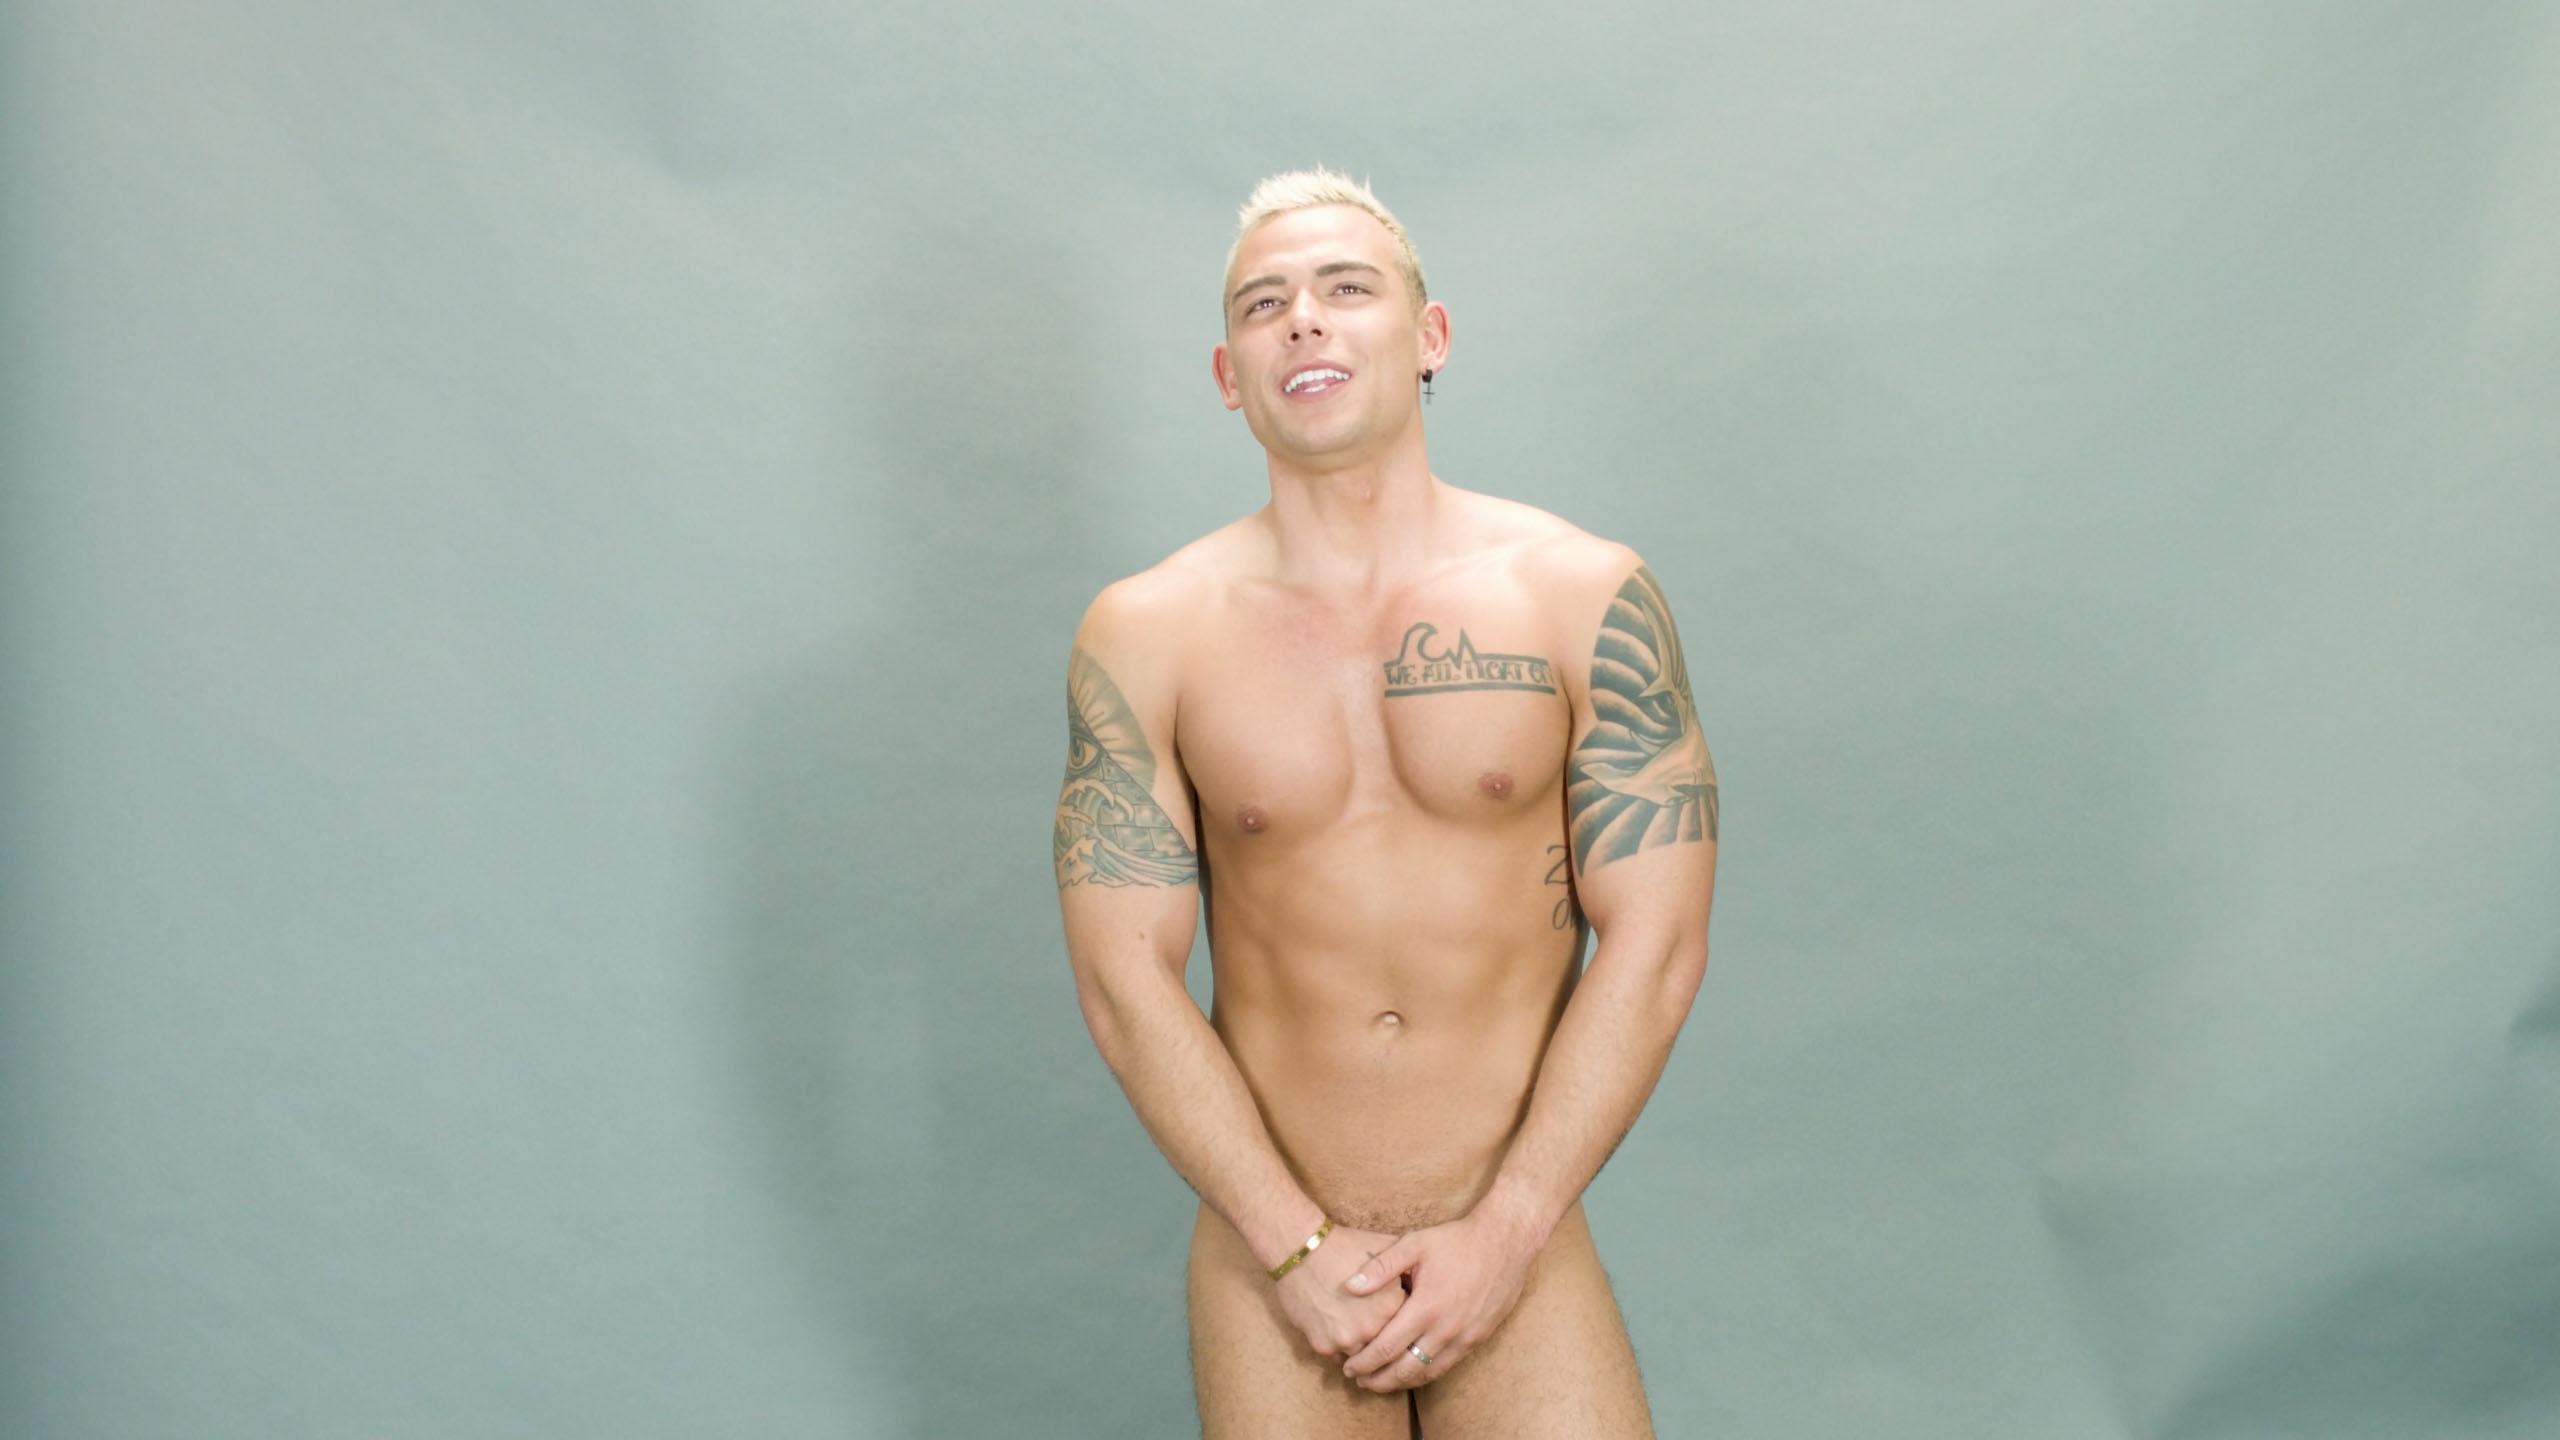 good, agree big tit blonde masturbates in the bath spencer scott Shine sorry